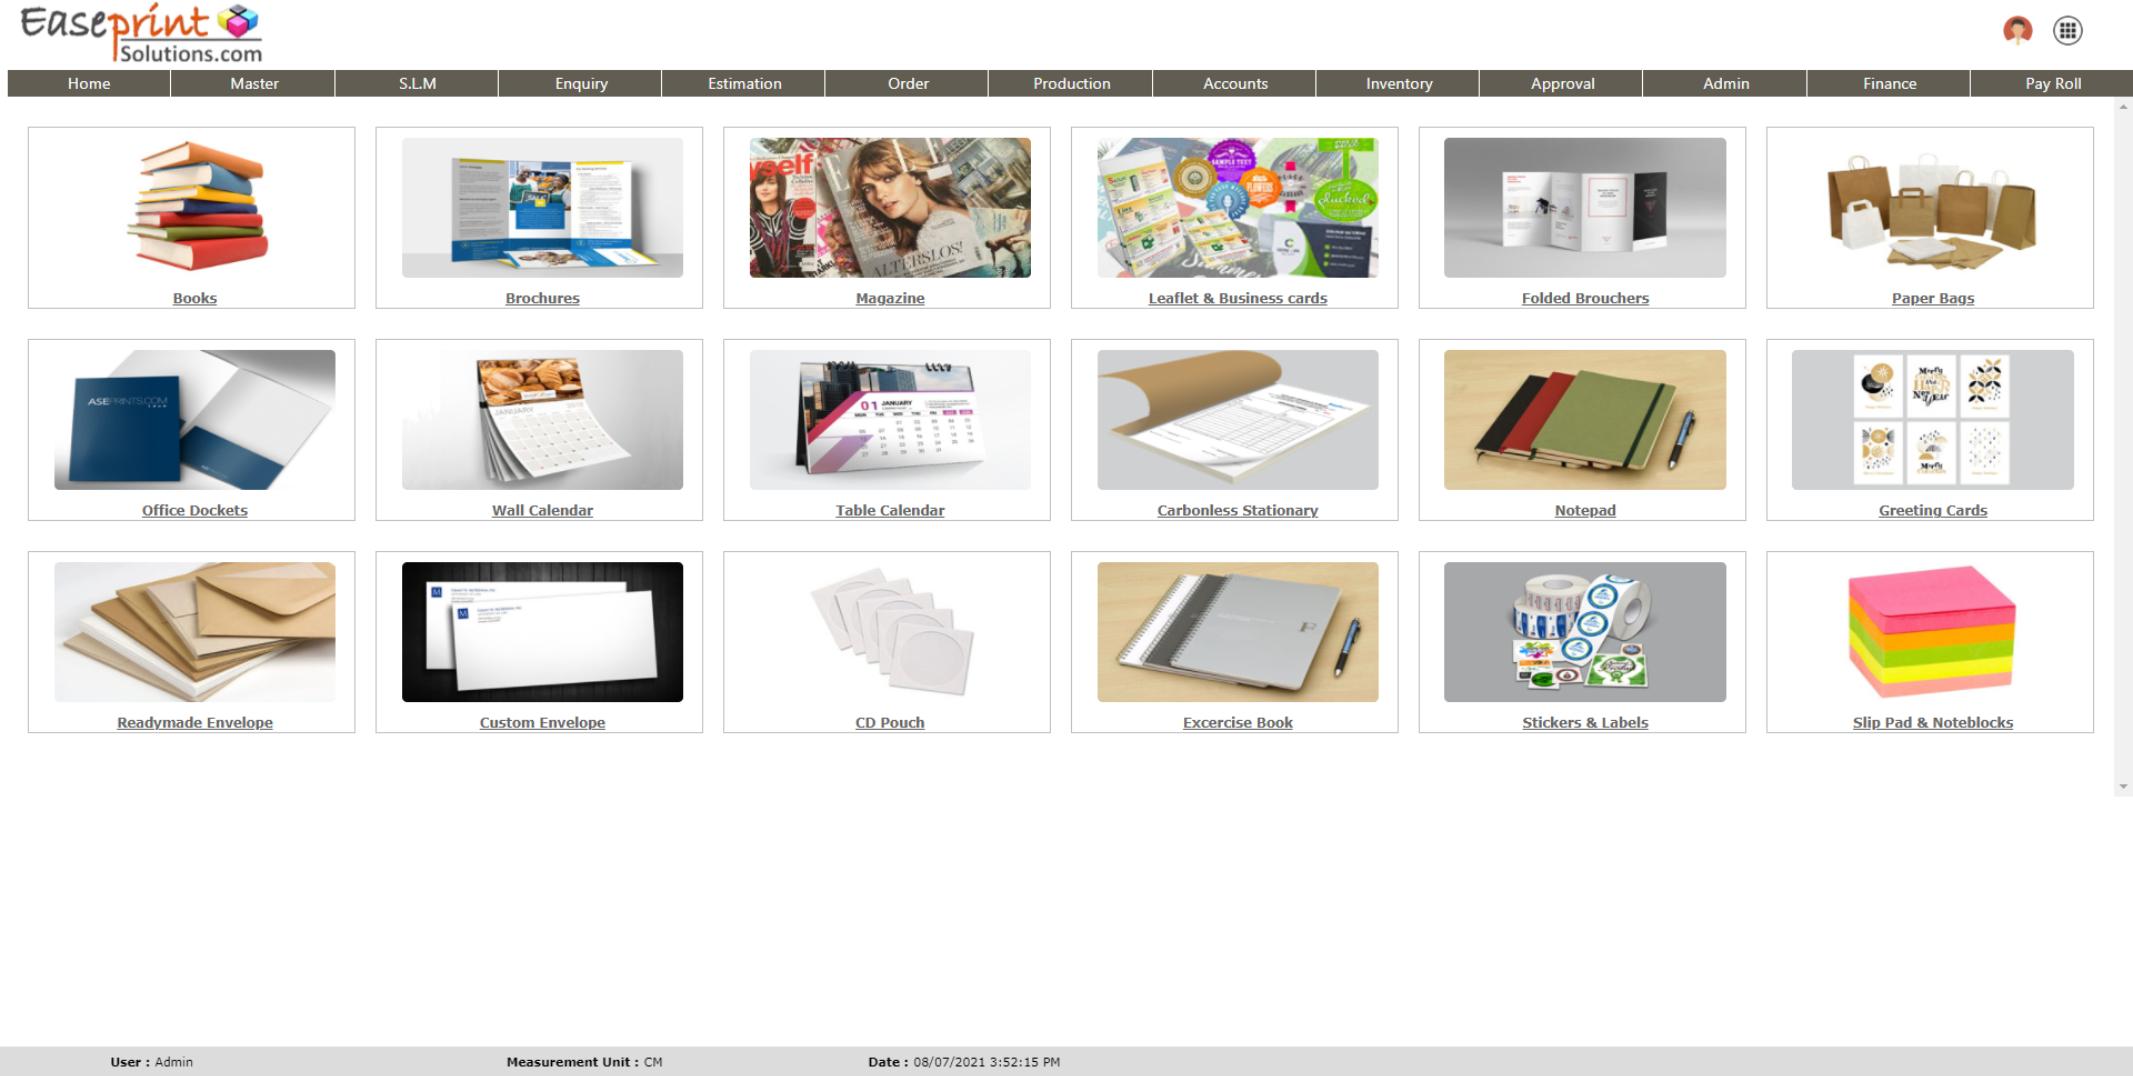 Easeprint Software - COMMERCIAL ESTIMATION